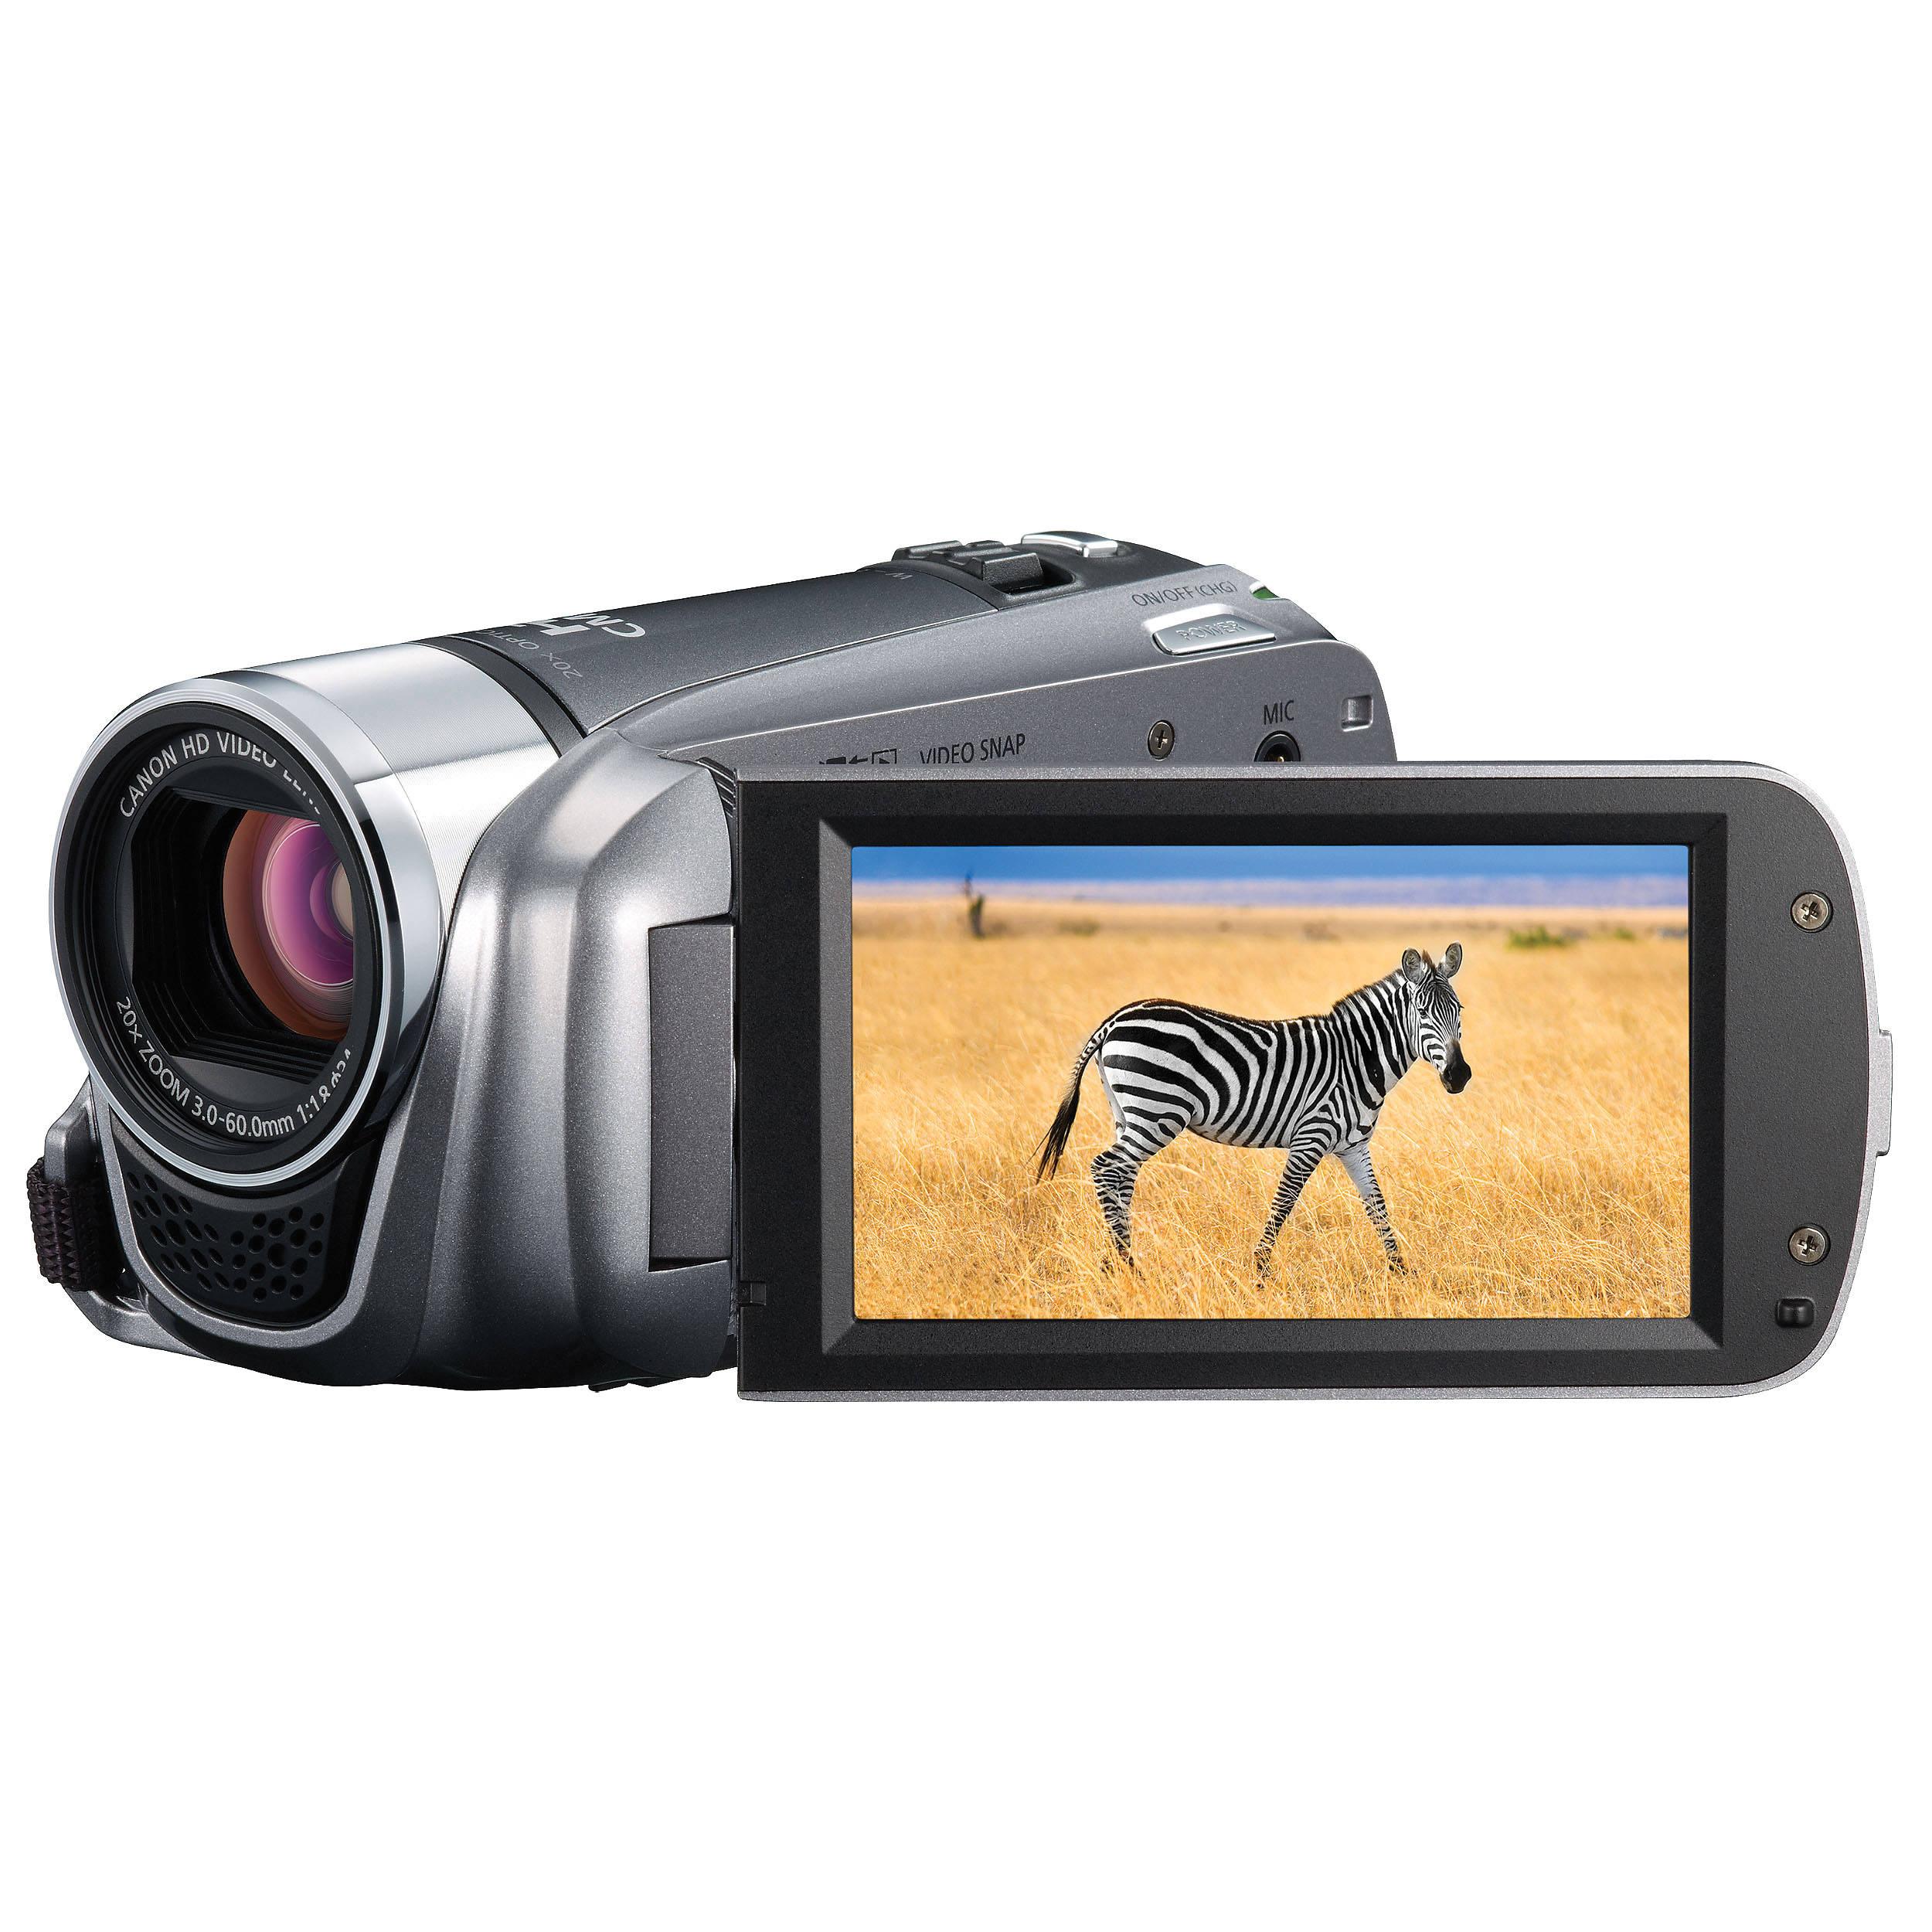 canon vixia hf r200 flash memory camcorder 4906b002 b h photo rh bhphotovideo com canon vixia hf r200 user manual vixia hf r500 manual